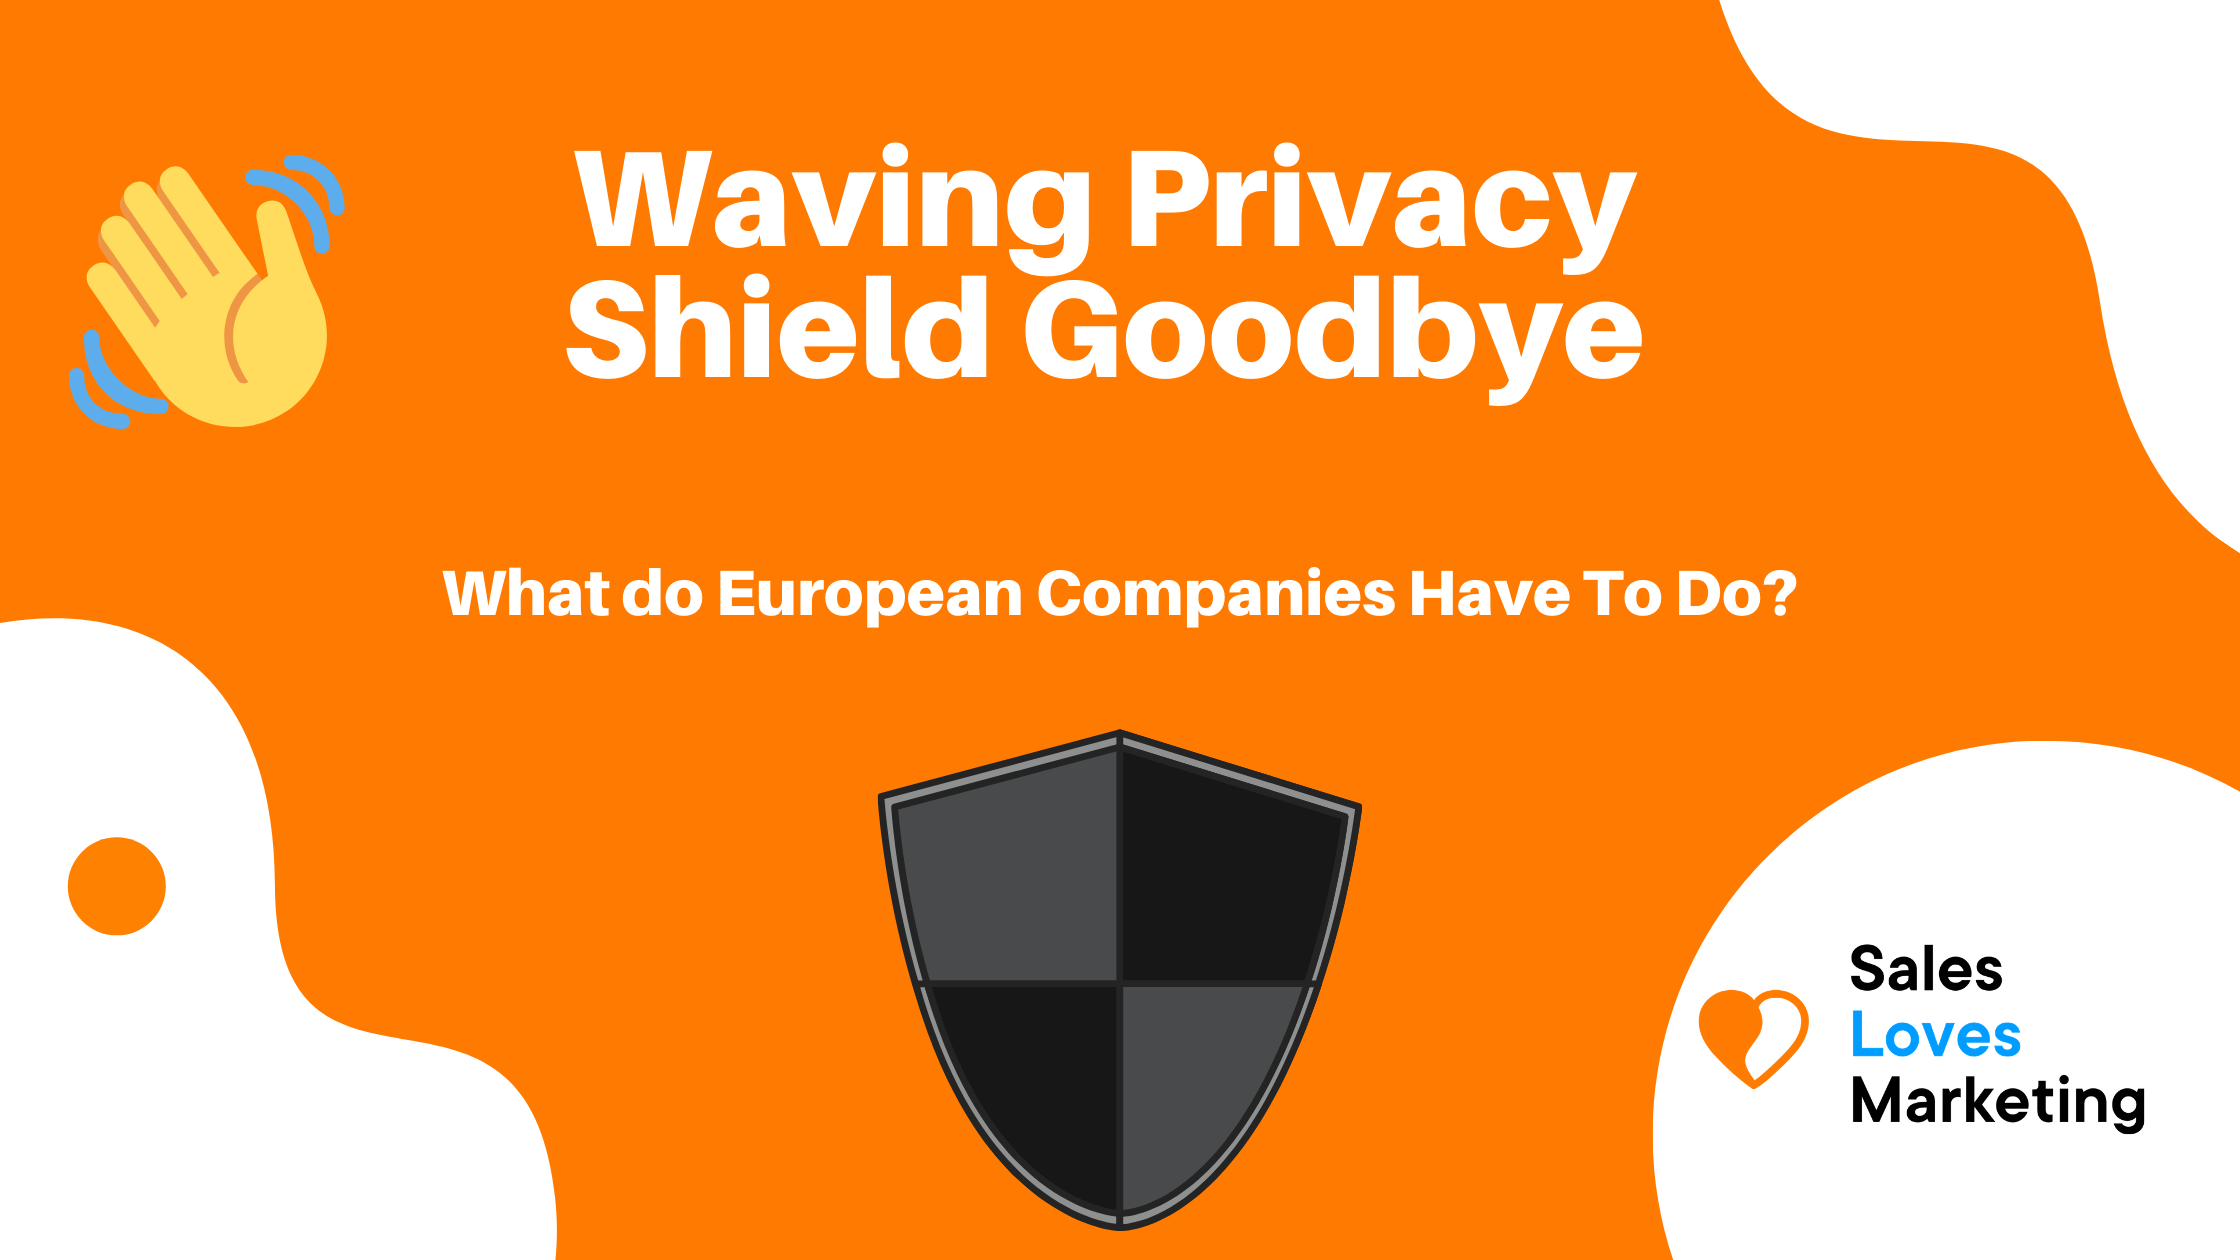 Wat do European Companies need to do to maintain GDPR compliancy?